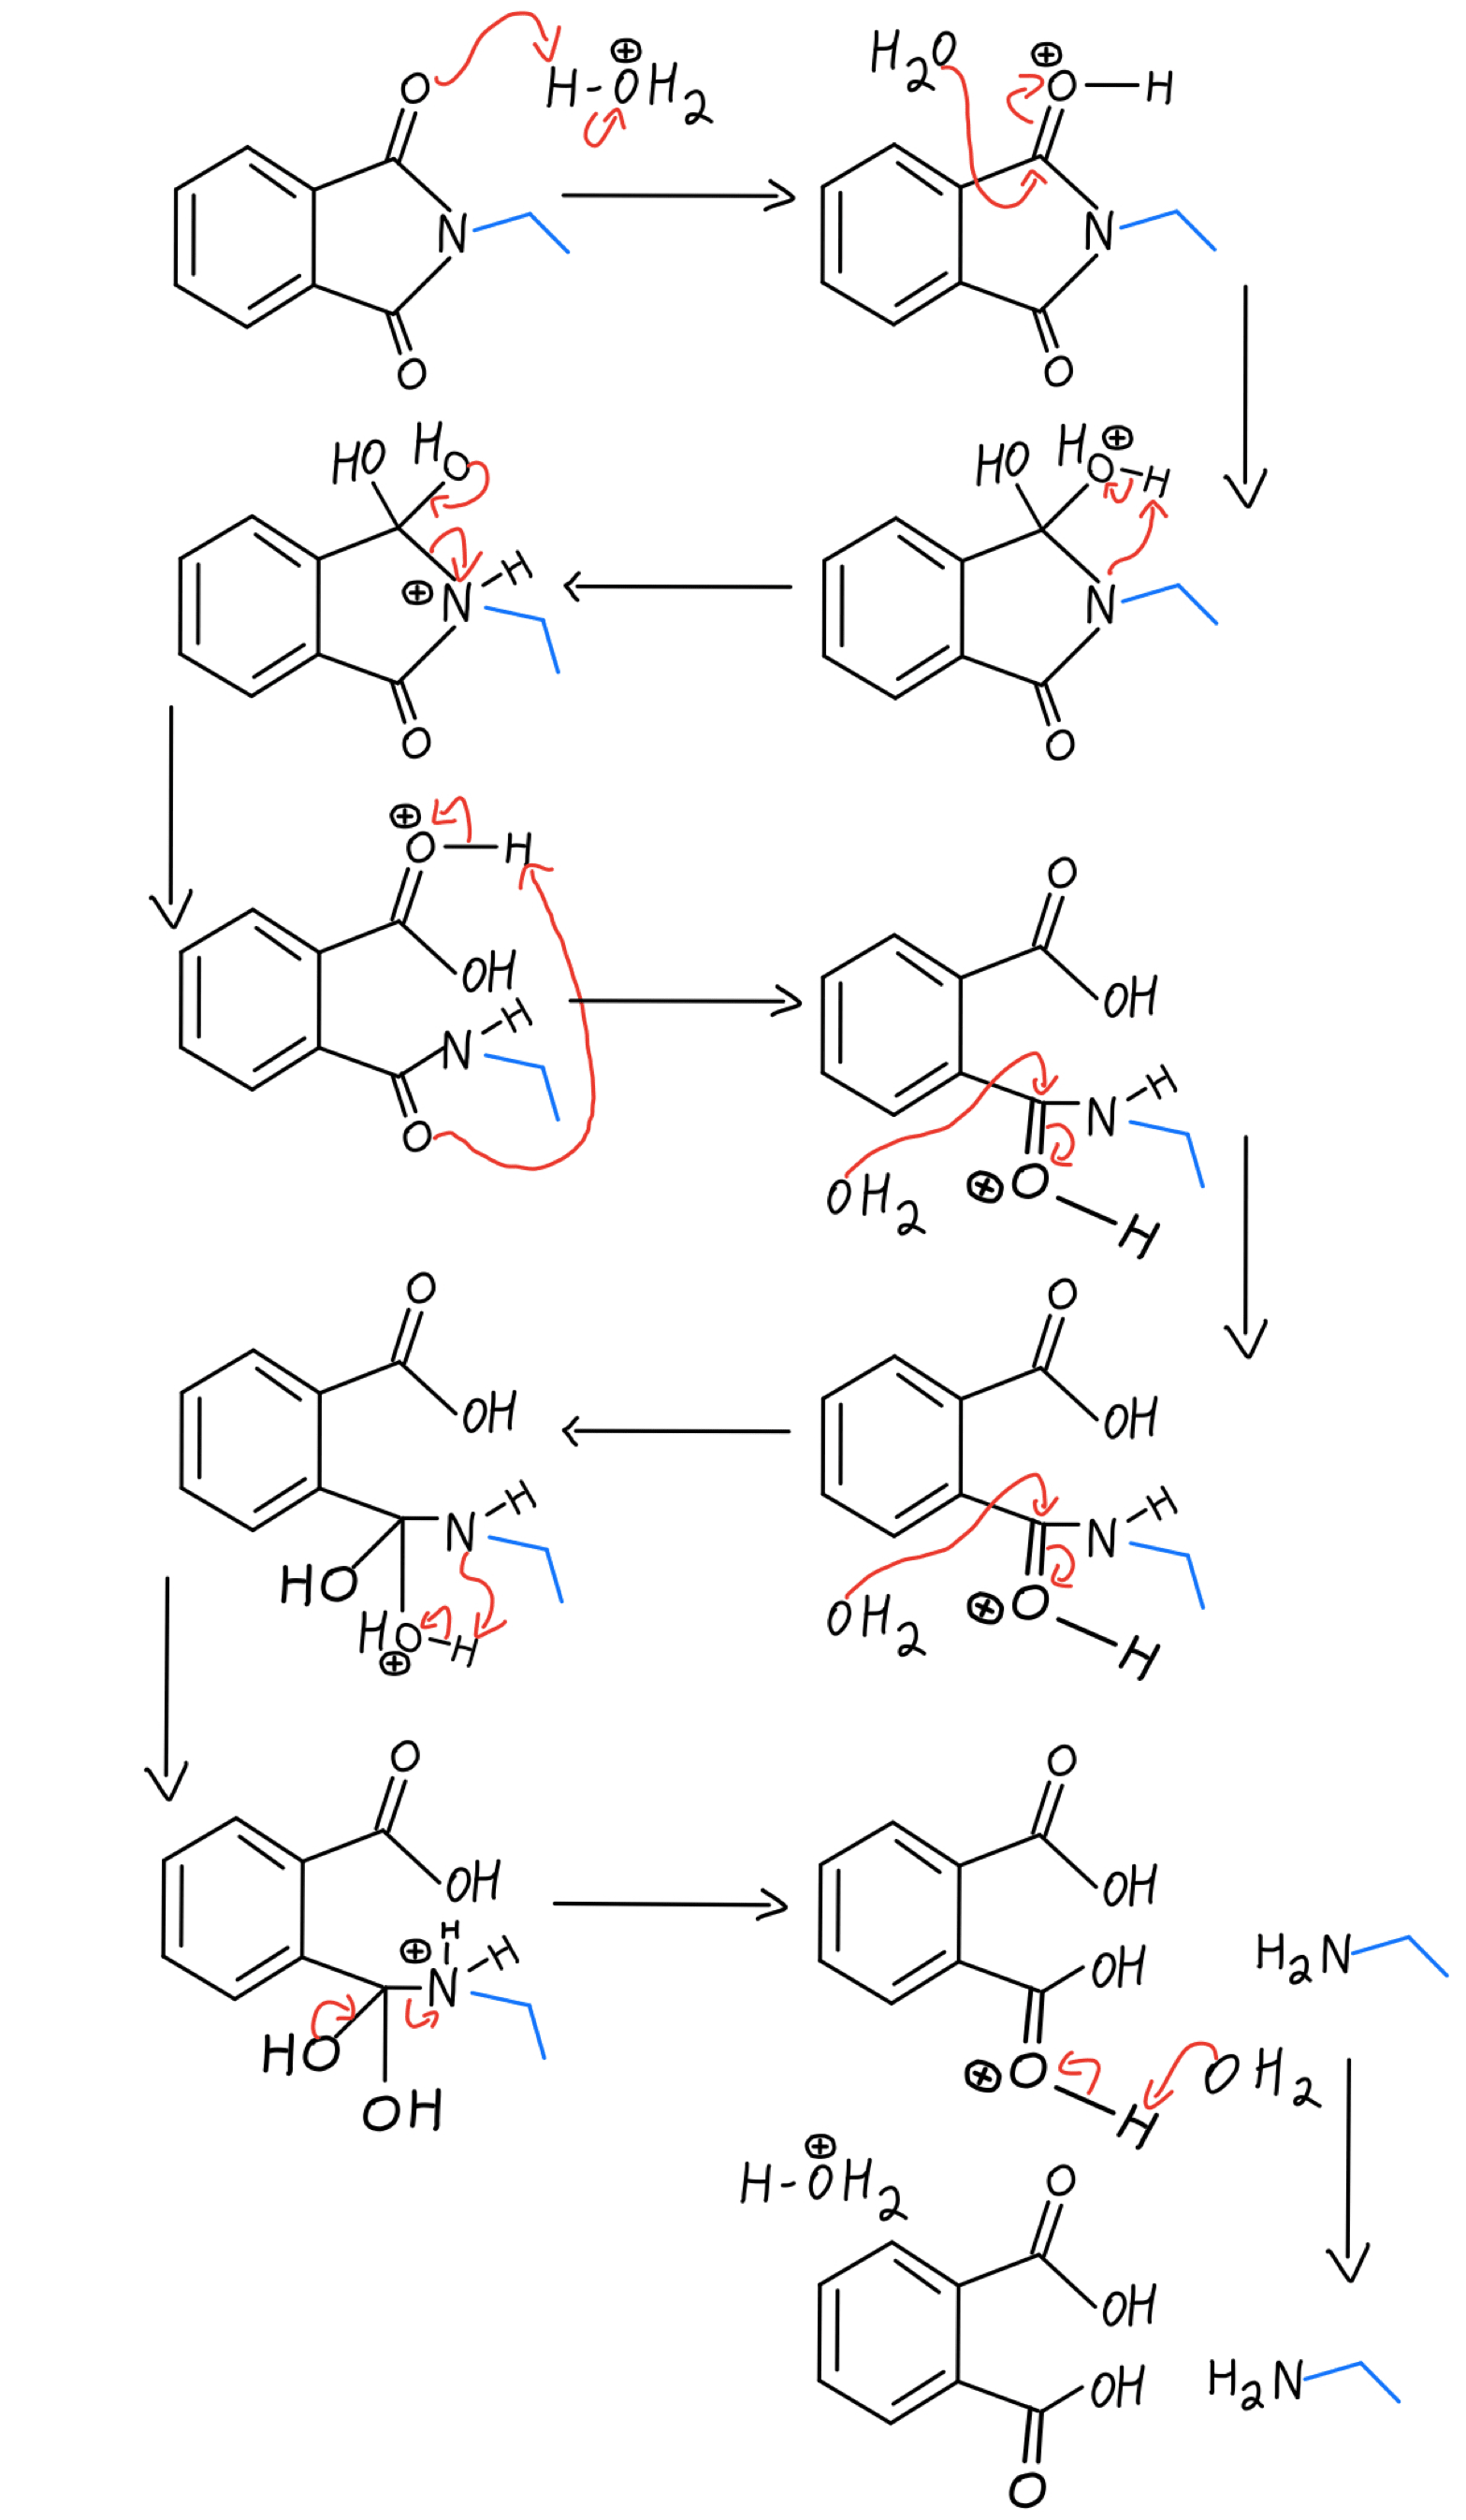 Acidic hydrolysis mechanism